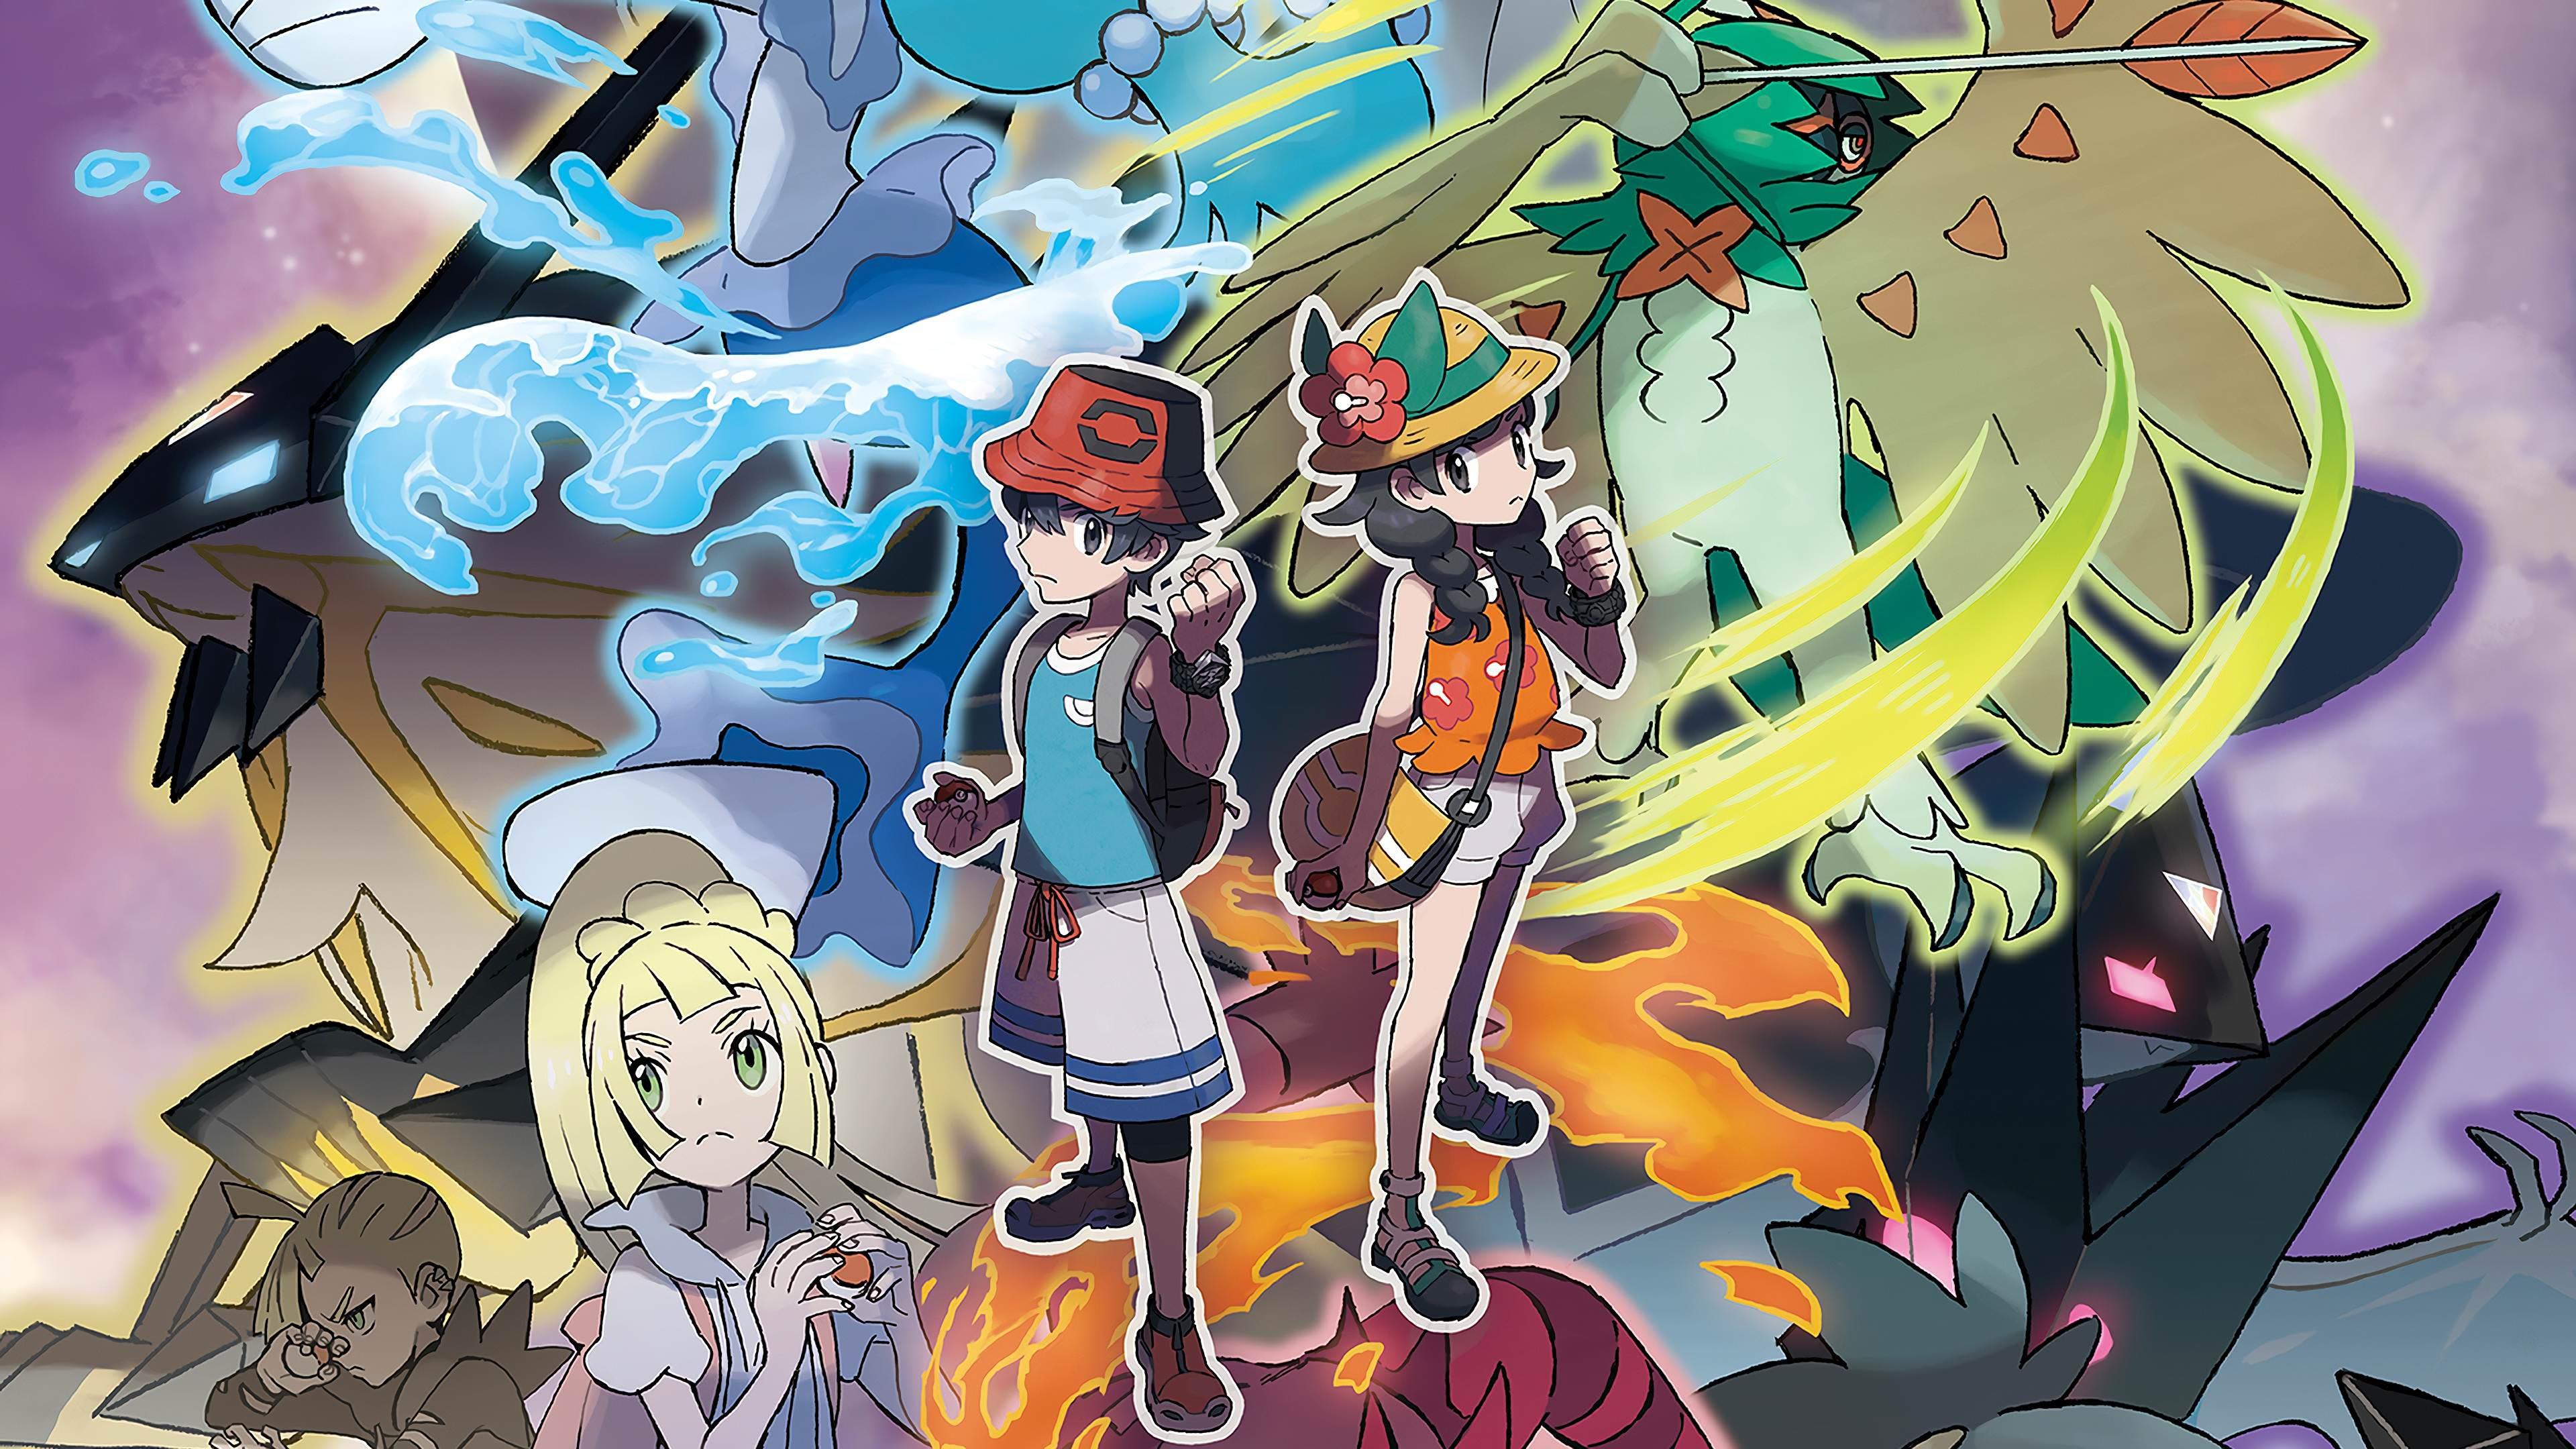 Pokemon Ultra Sun And Moon Wallpapers Top Free Pokemon Ultra Sun